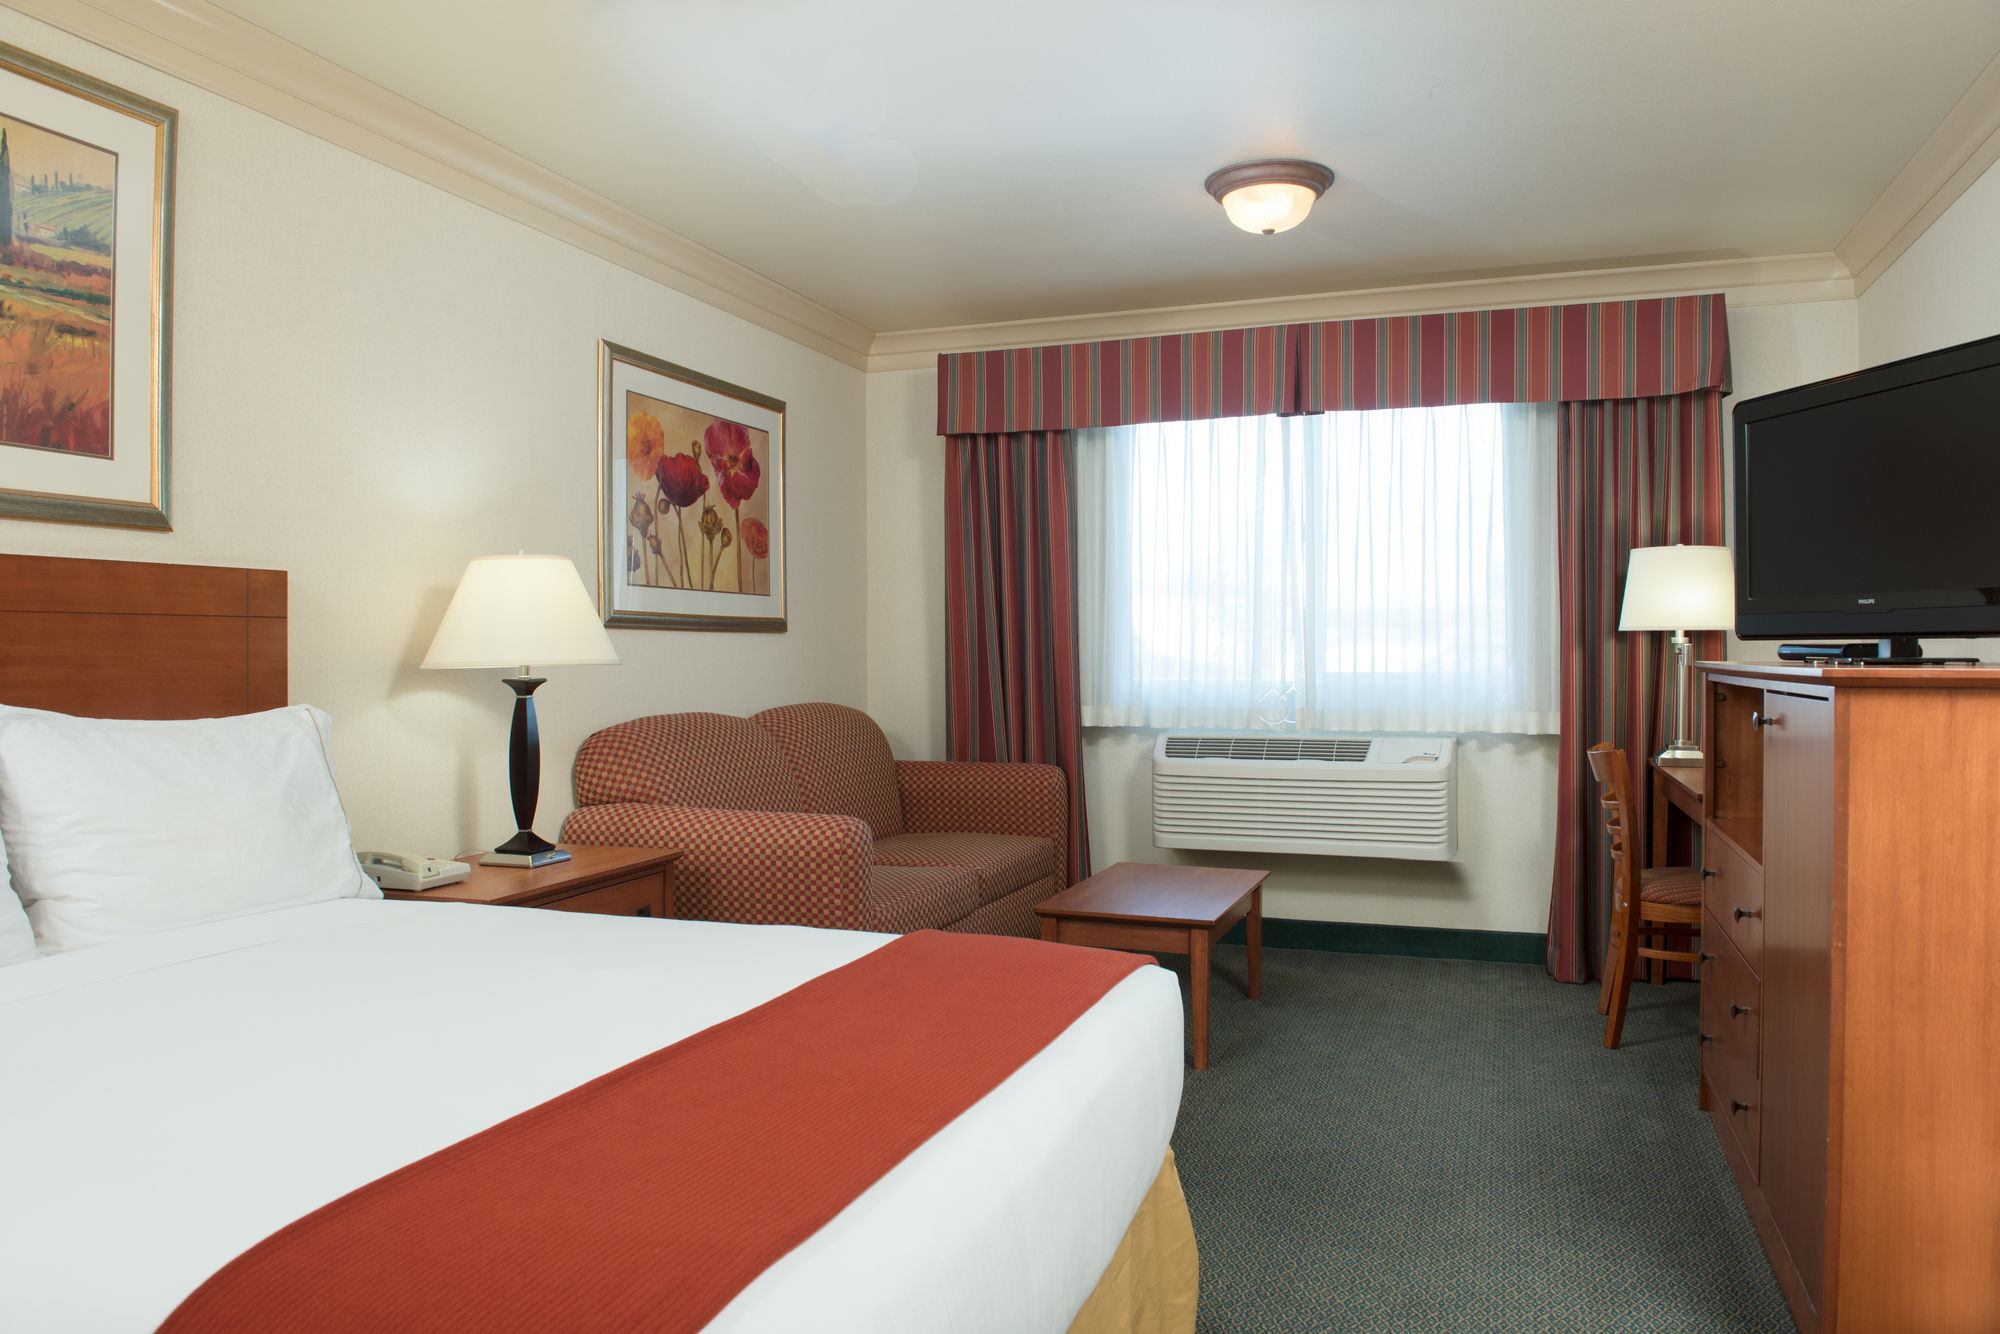 burlington hotel coupons for burlington washington. Black Bedroom Furniture Sets. Home Design Ideas